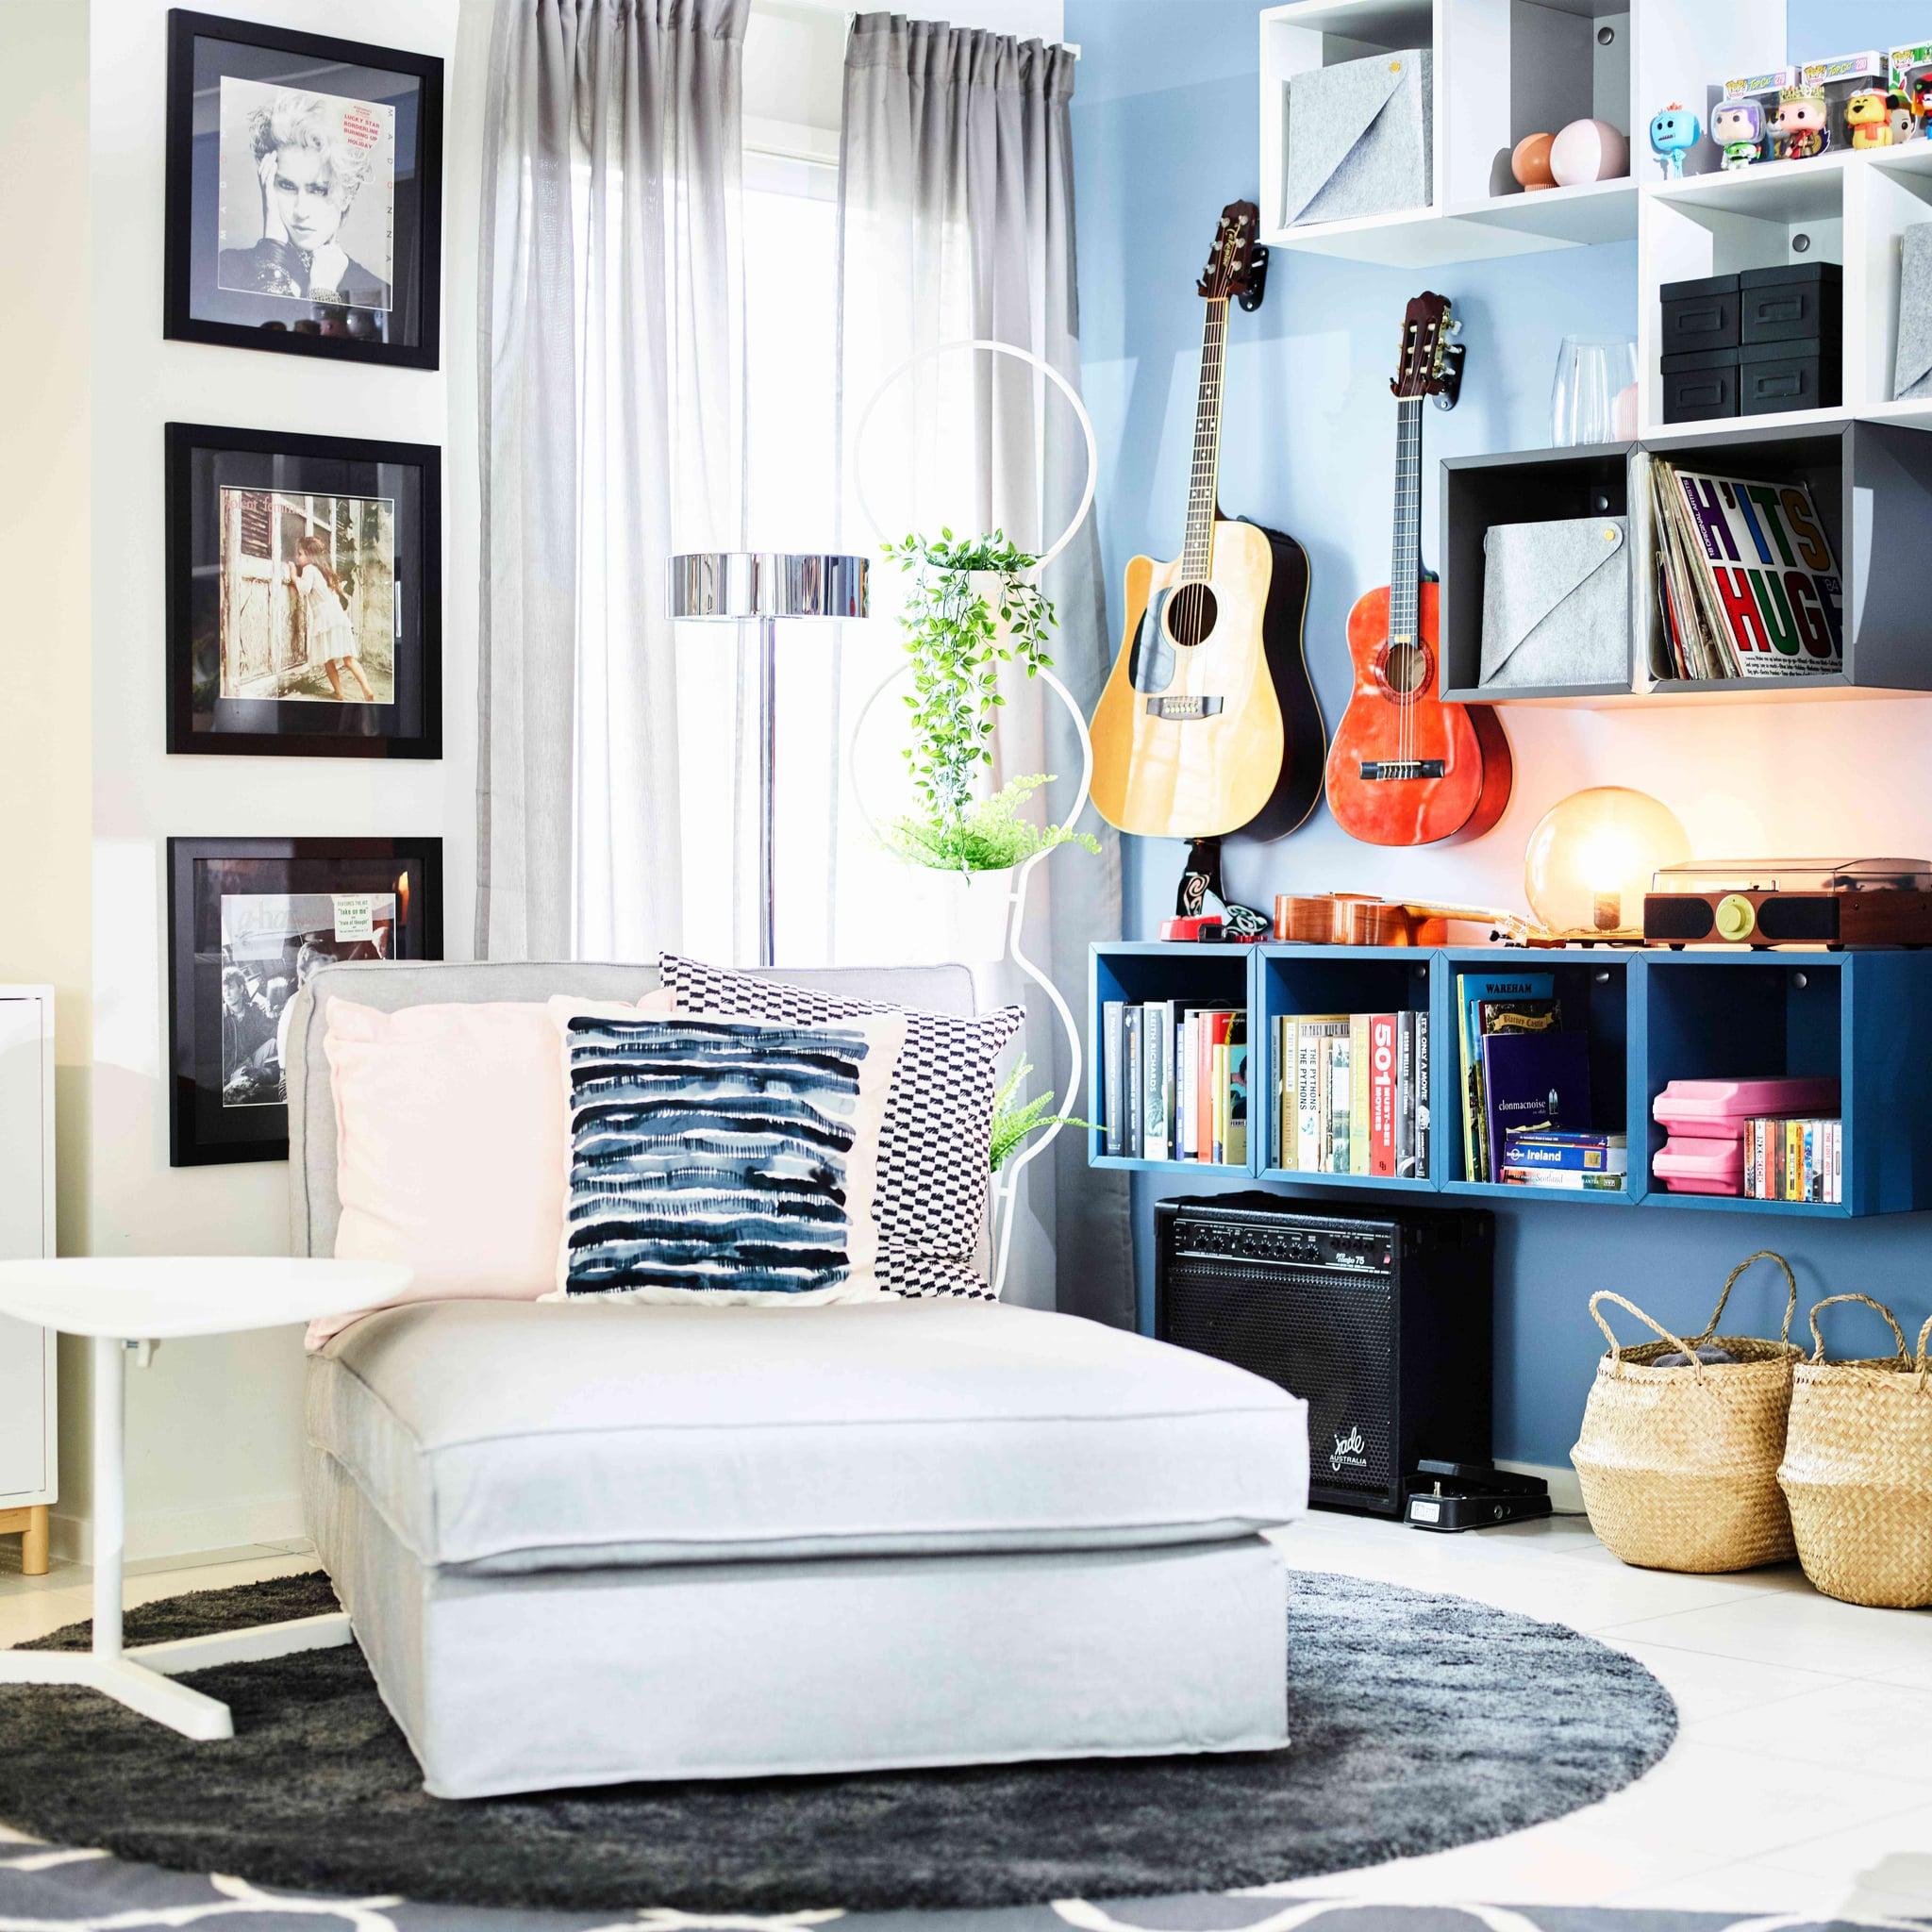 Ikea Living Room Photos ikea living room decorating tips   popsugar home australia